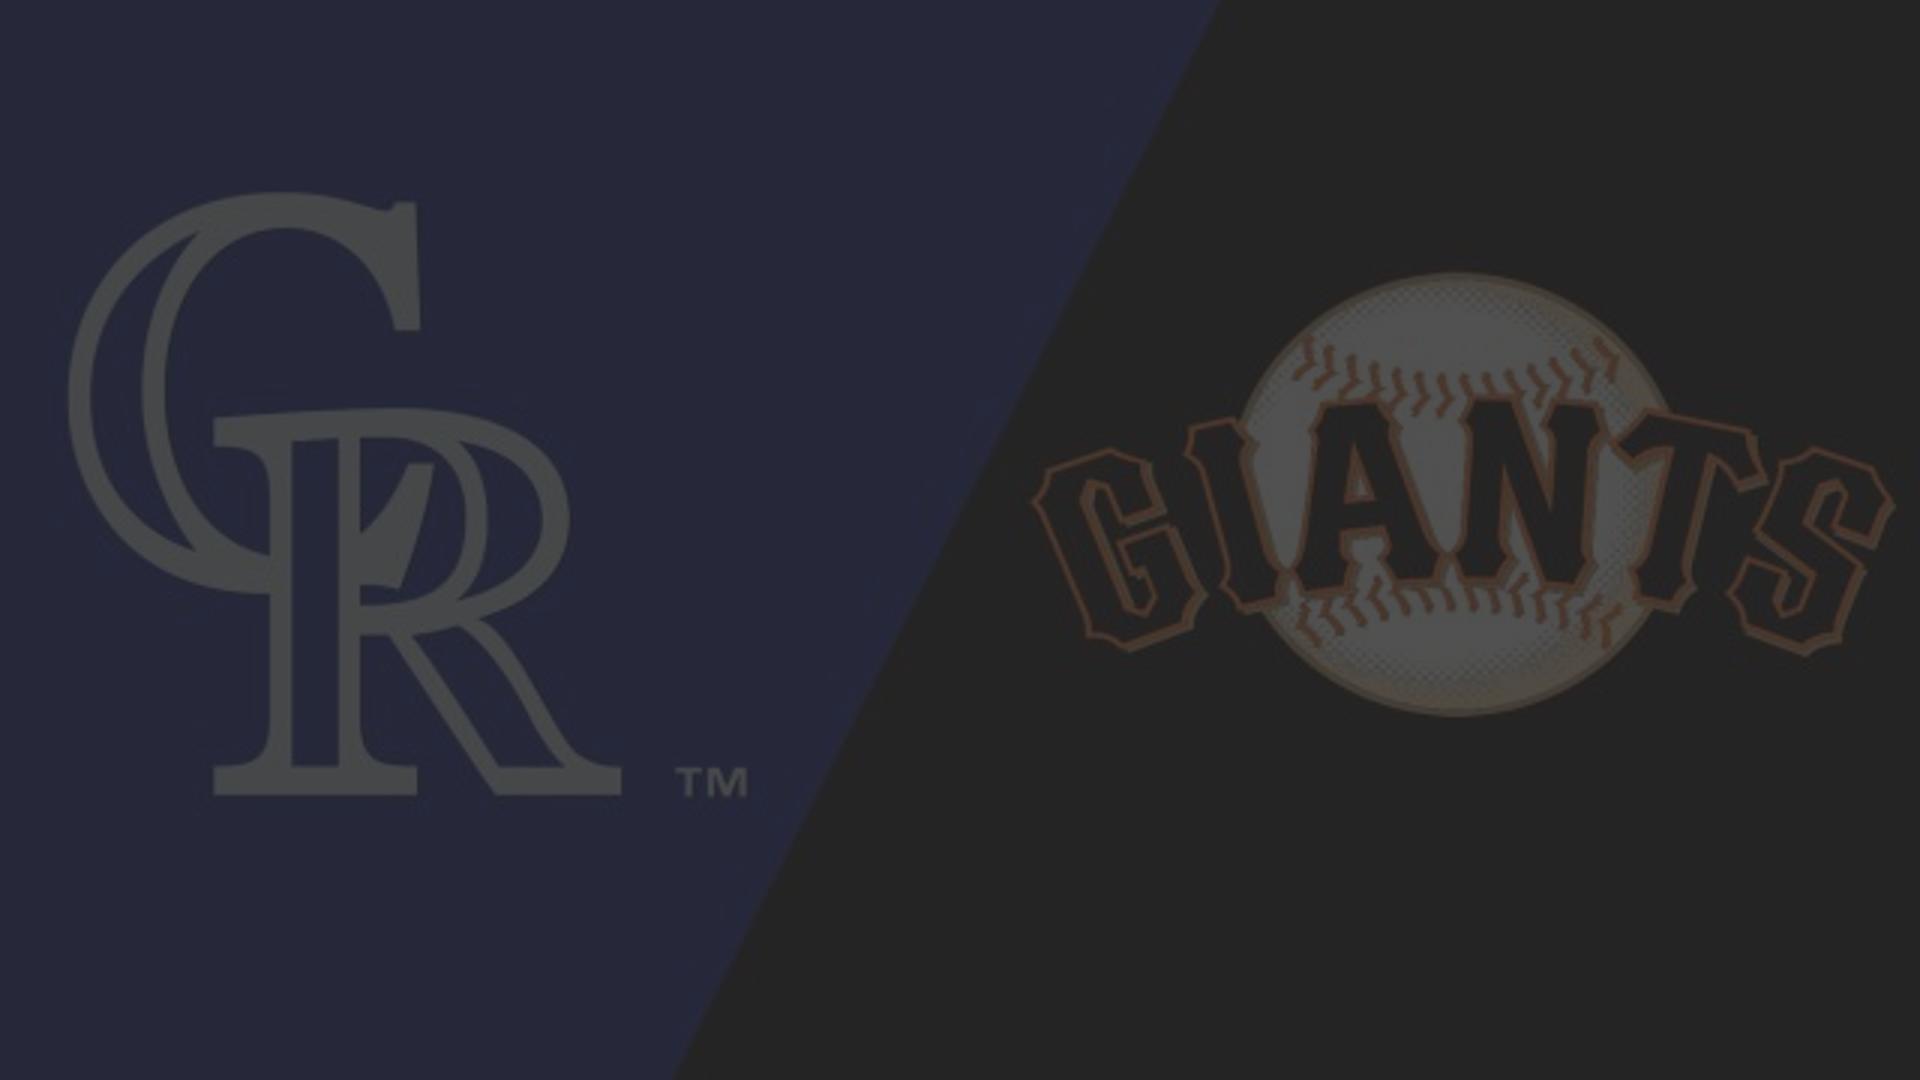 colorado rockies vs. san francisco giants - watchespn